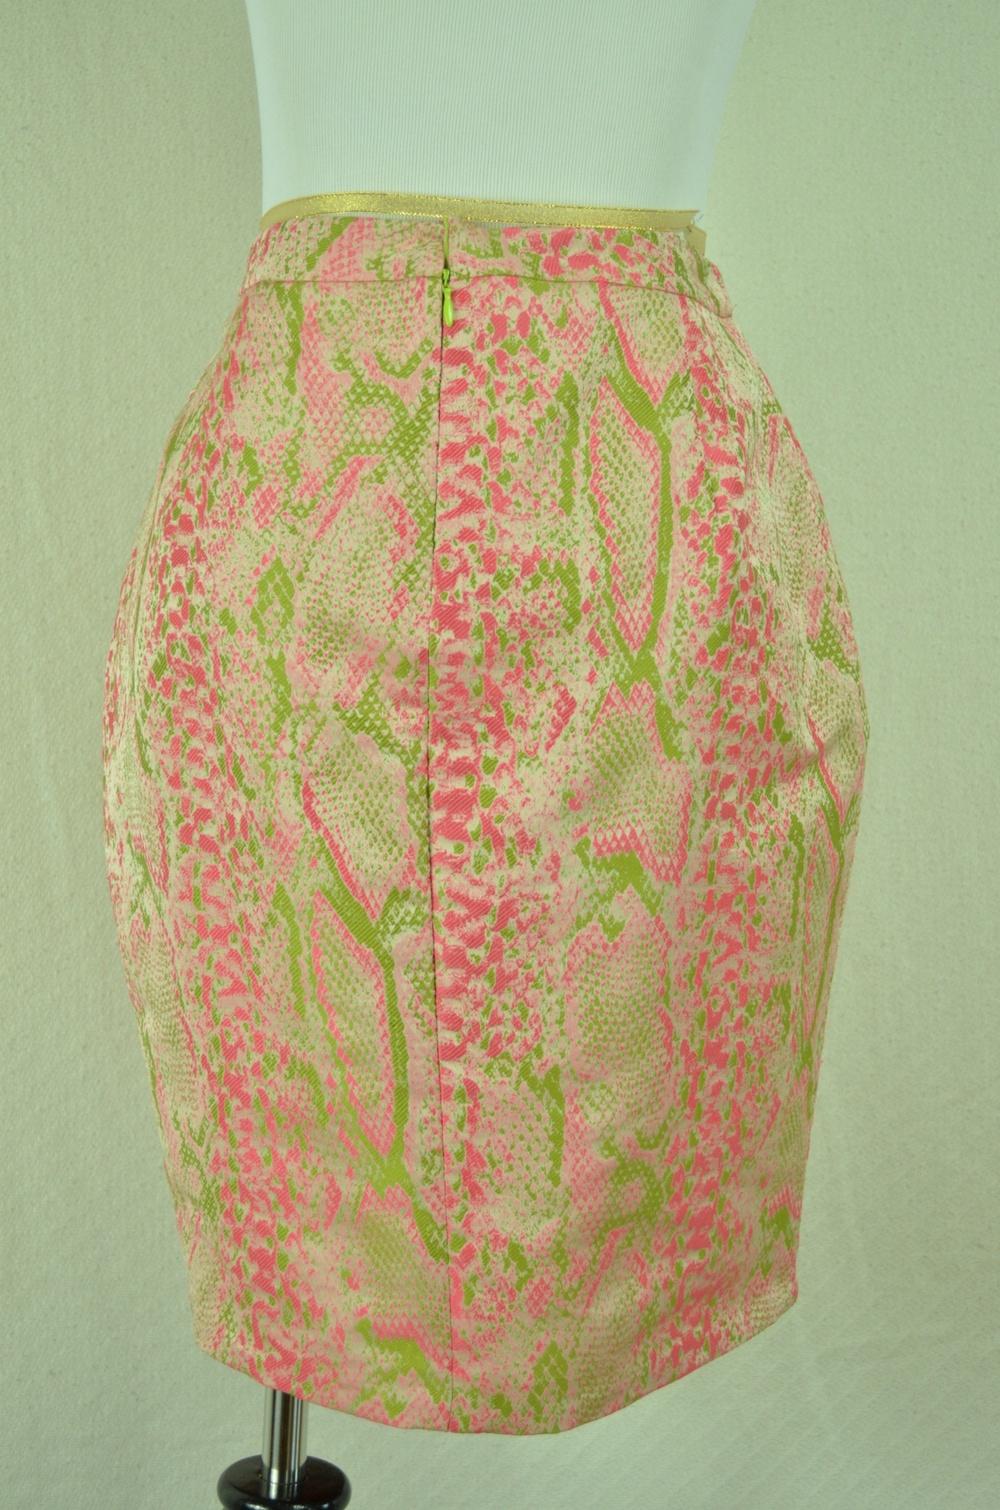 52. DKNY Lizard Print Skirt